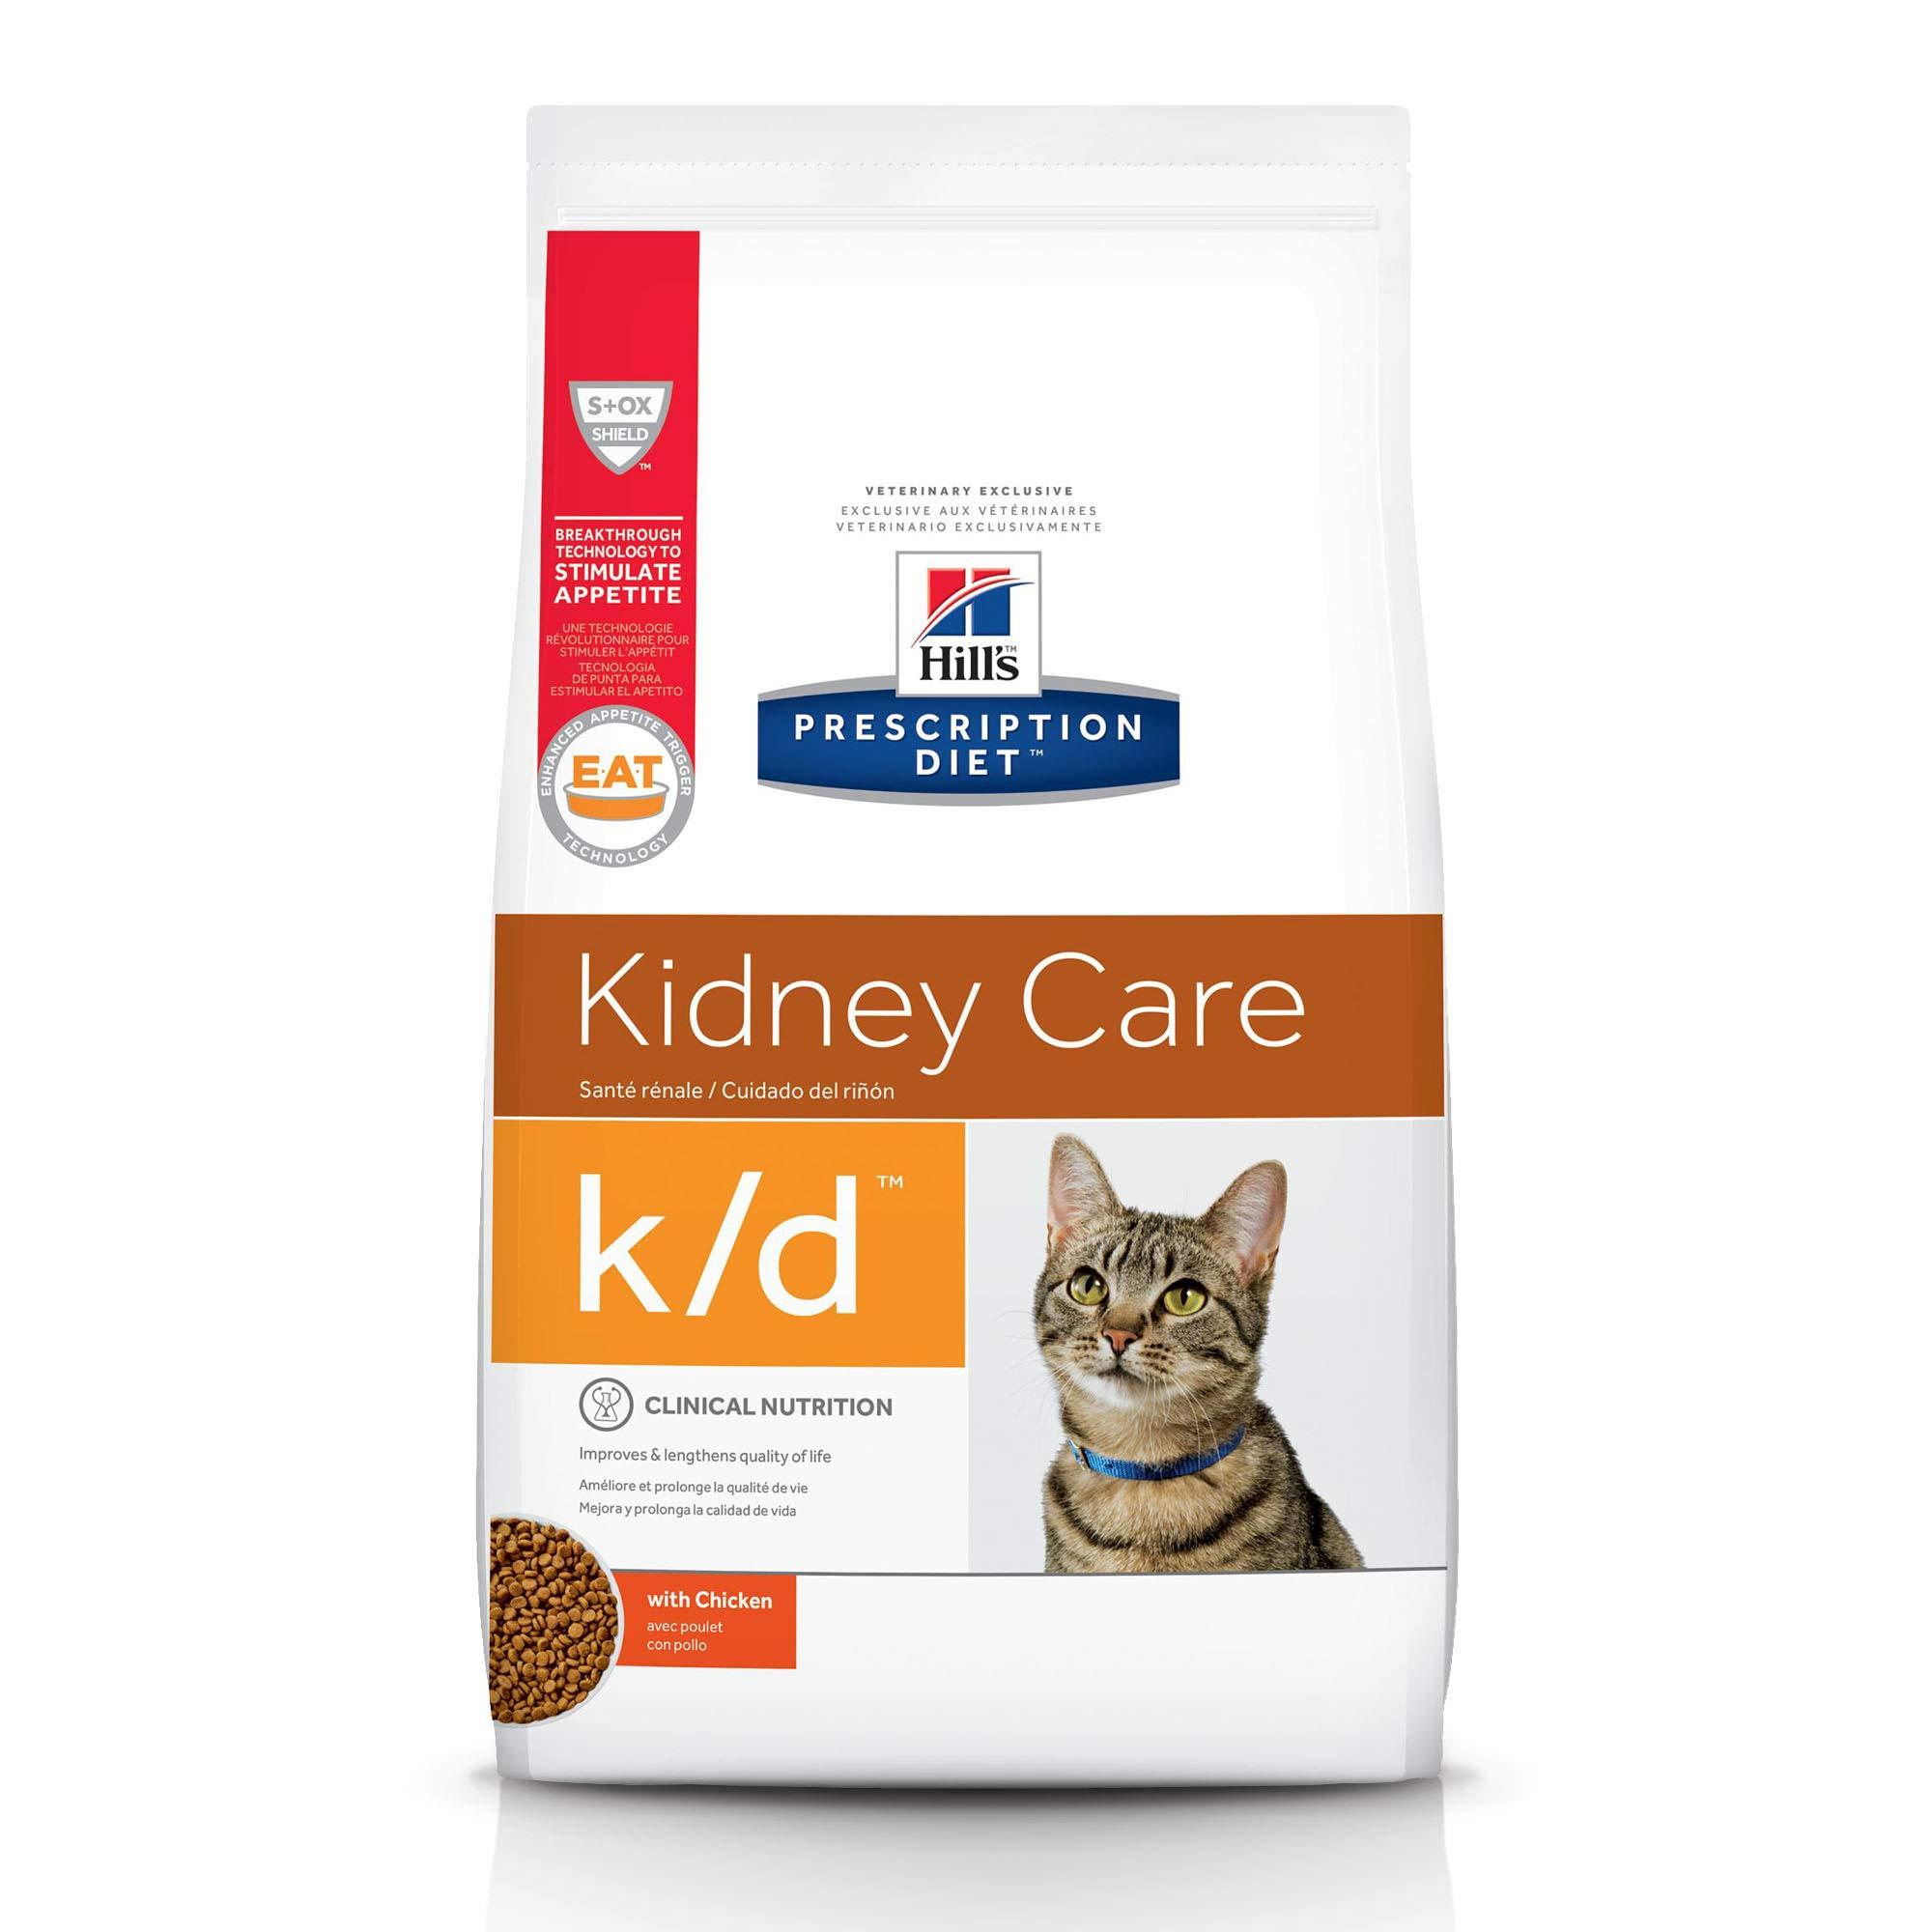 HILL'S PRESCRIPTION DIET Dry Cat Food, Veterinary Diet, k/d Kidney Care